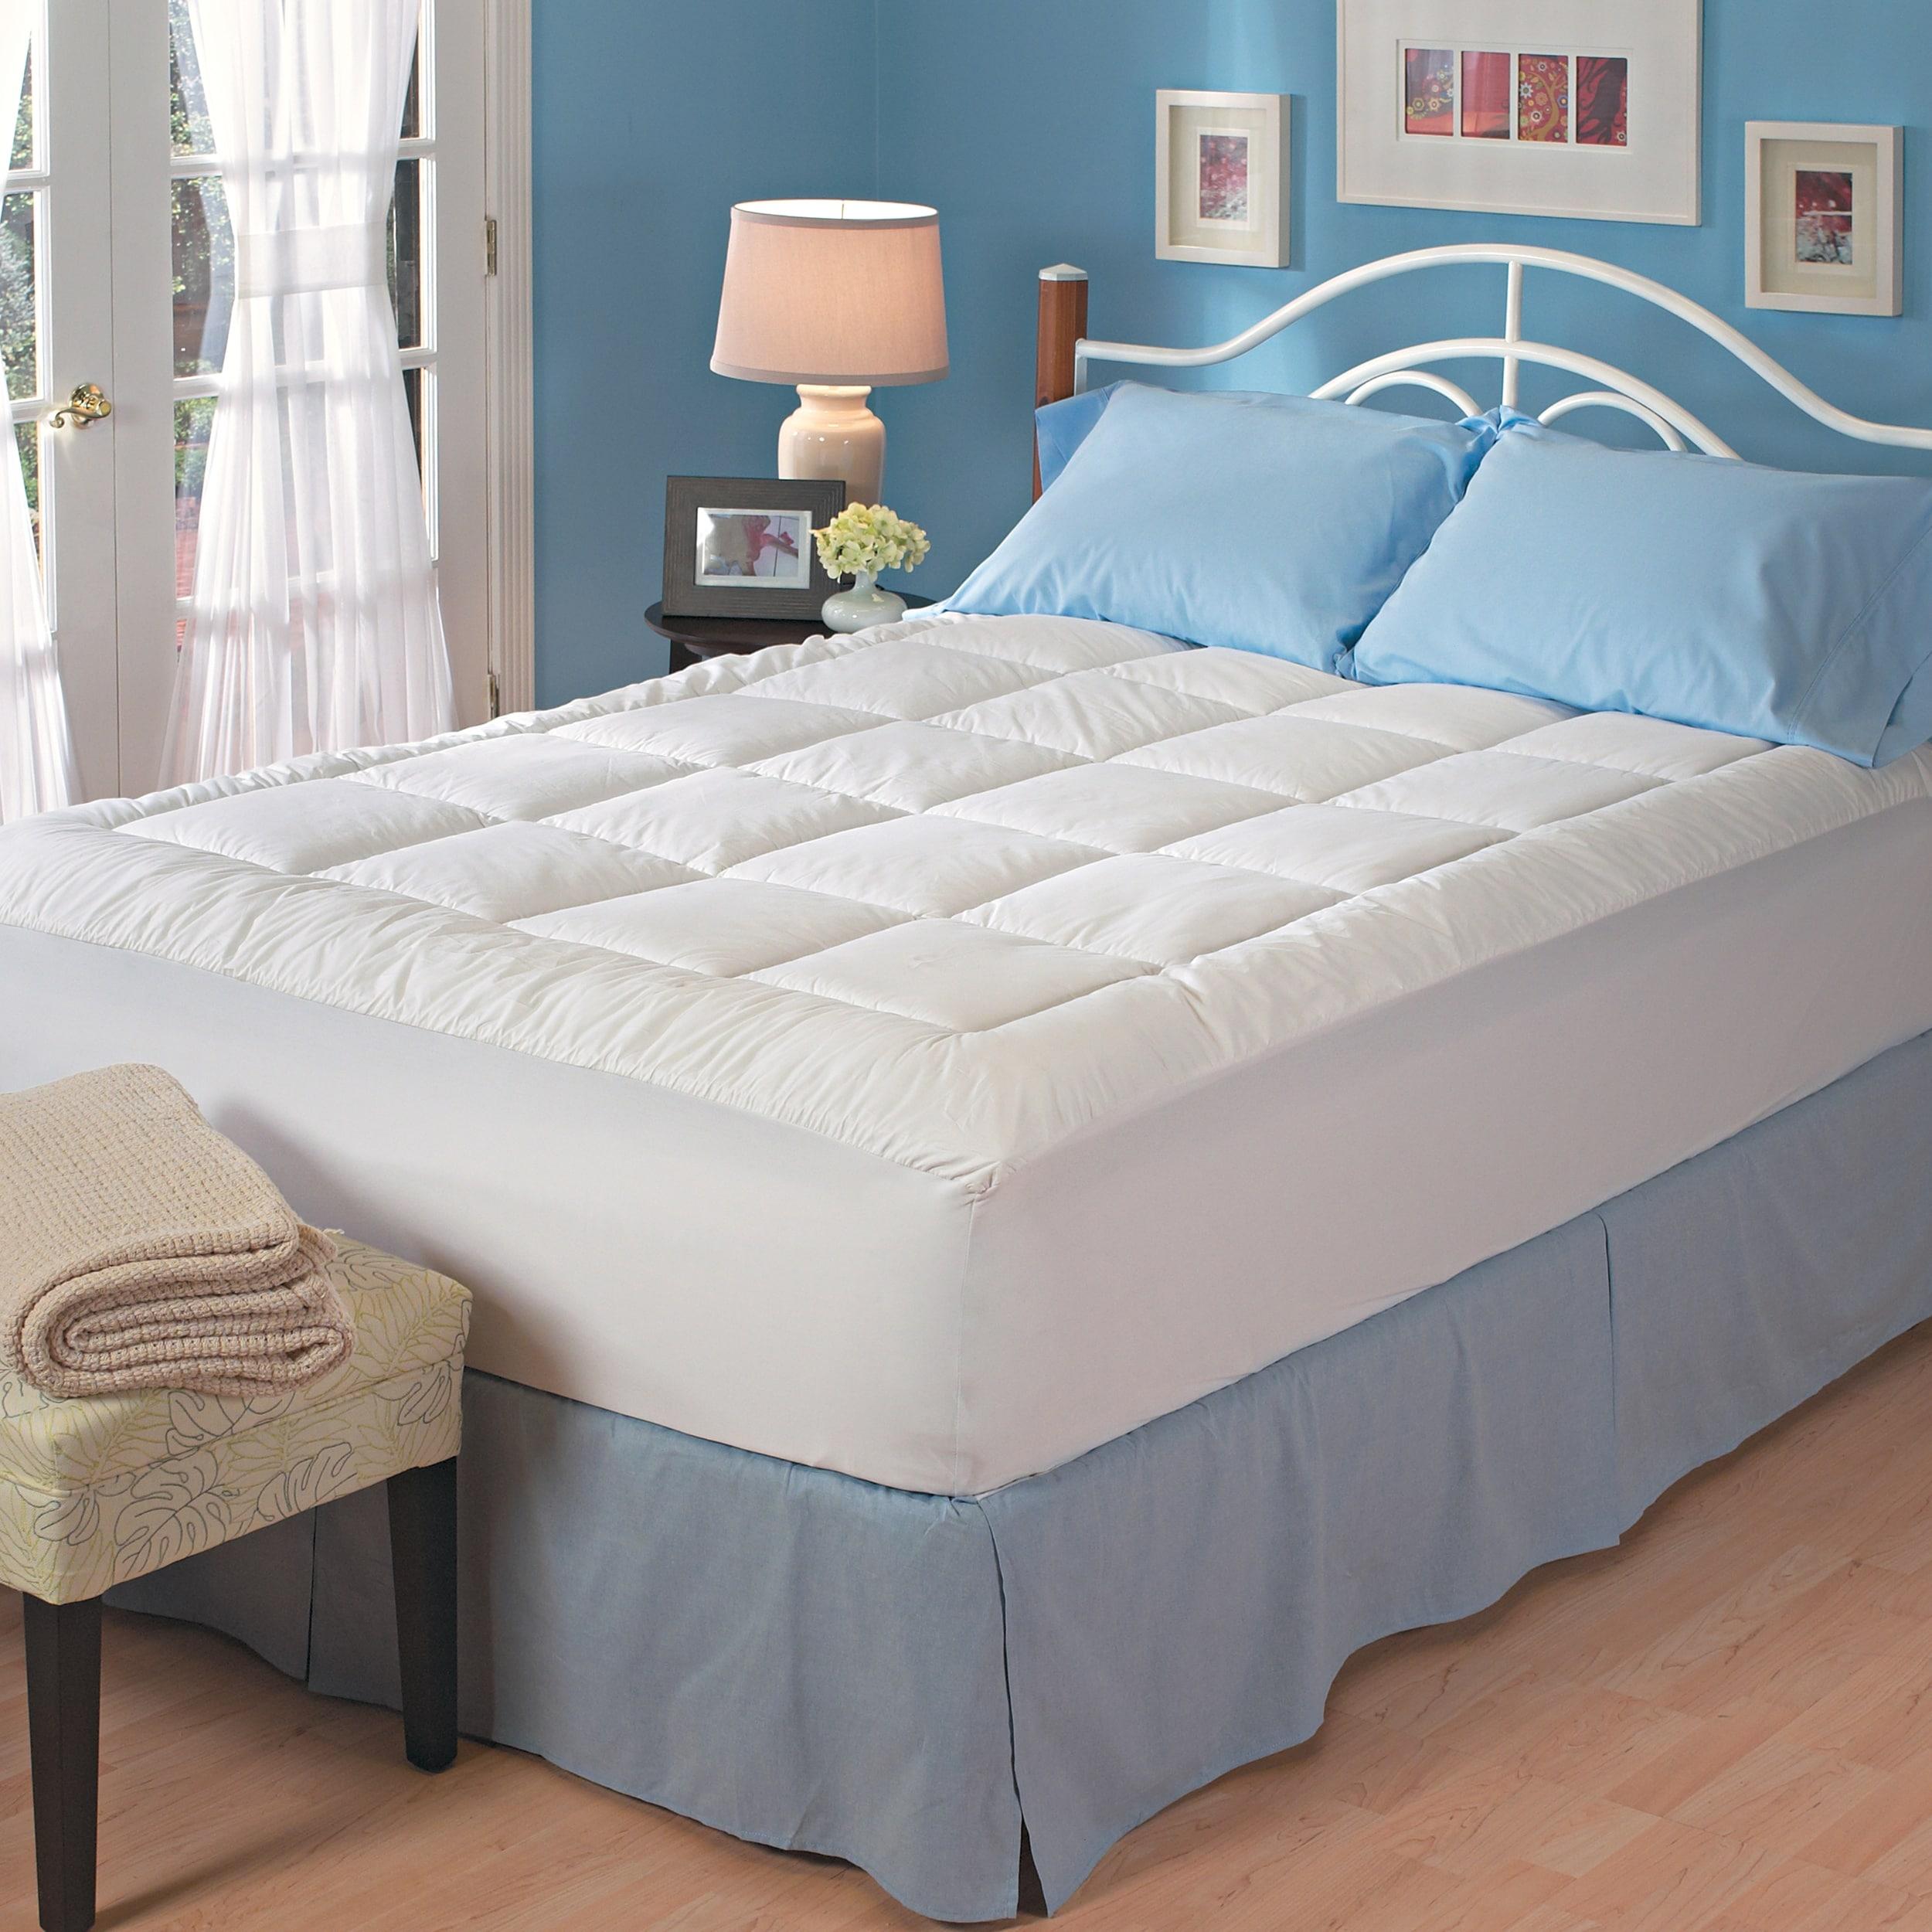 Famous Maker Luxury Comfort Mattress Topper Twin/Full/Twin Xlong